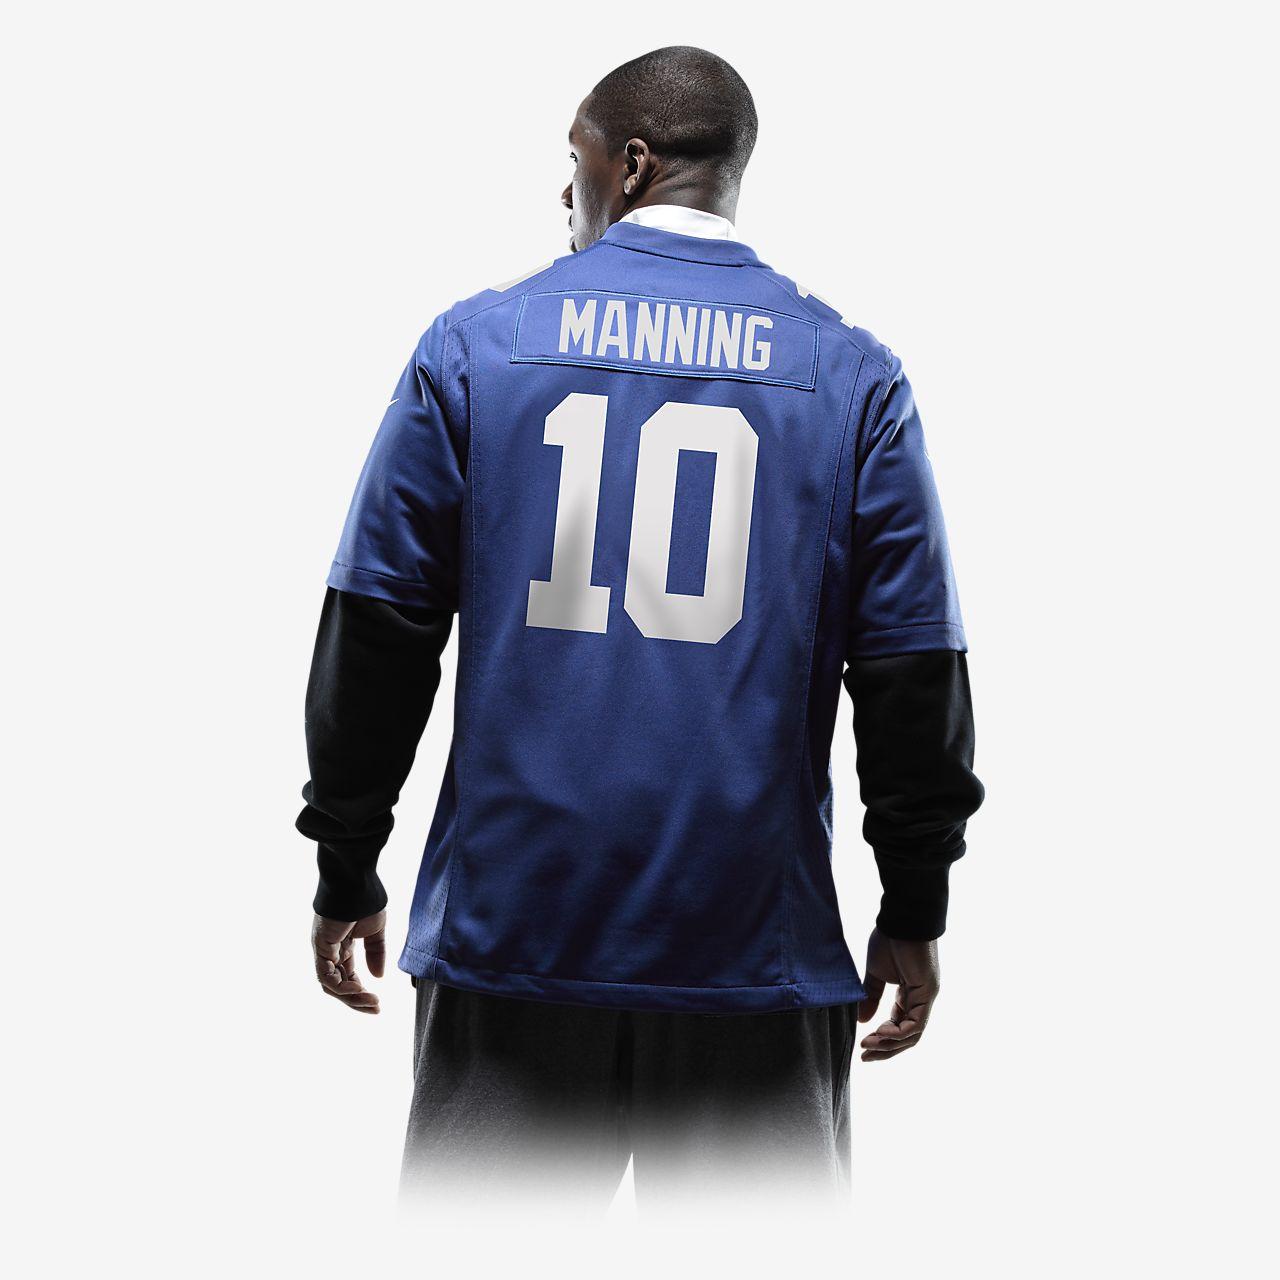 ... NFL New York Giants (Eli Manning) Camiseta de fútbol americano de la 1ª  equipación d3f76628139